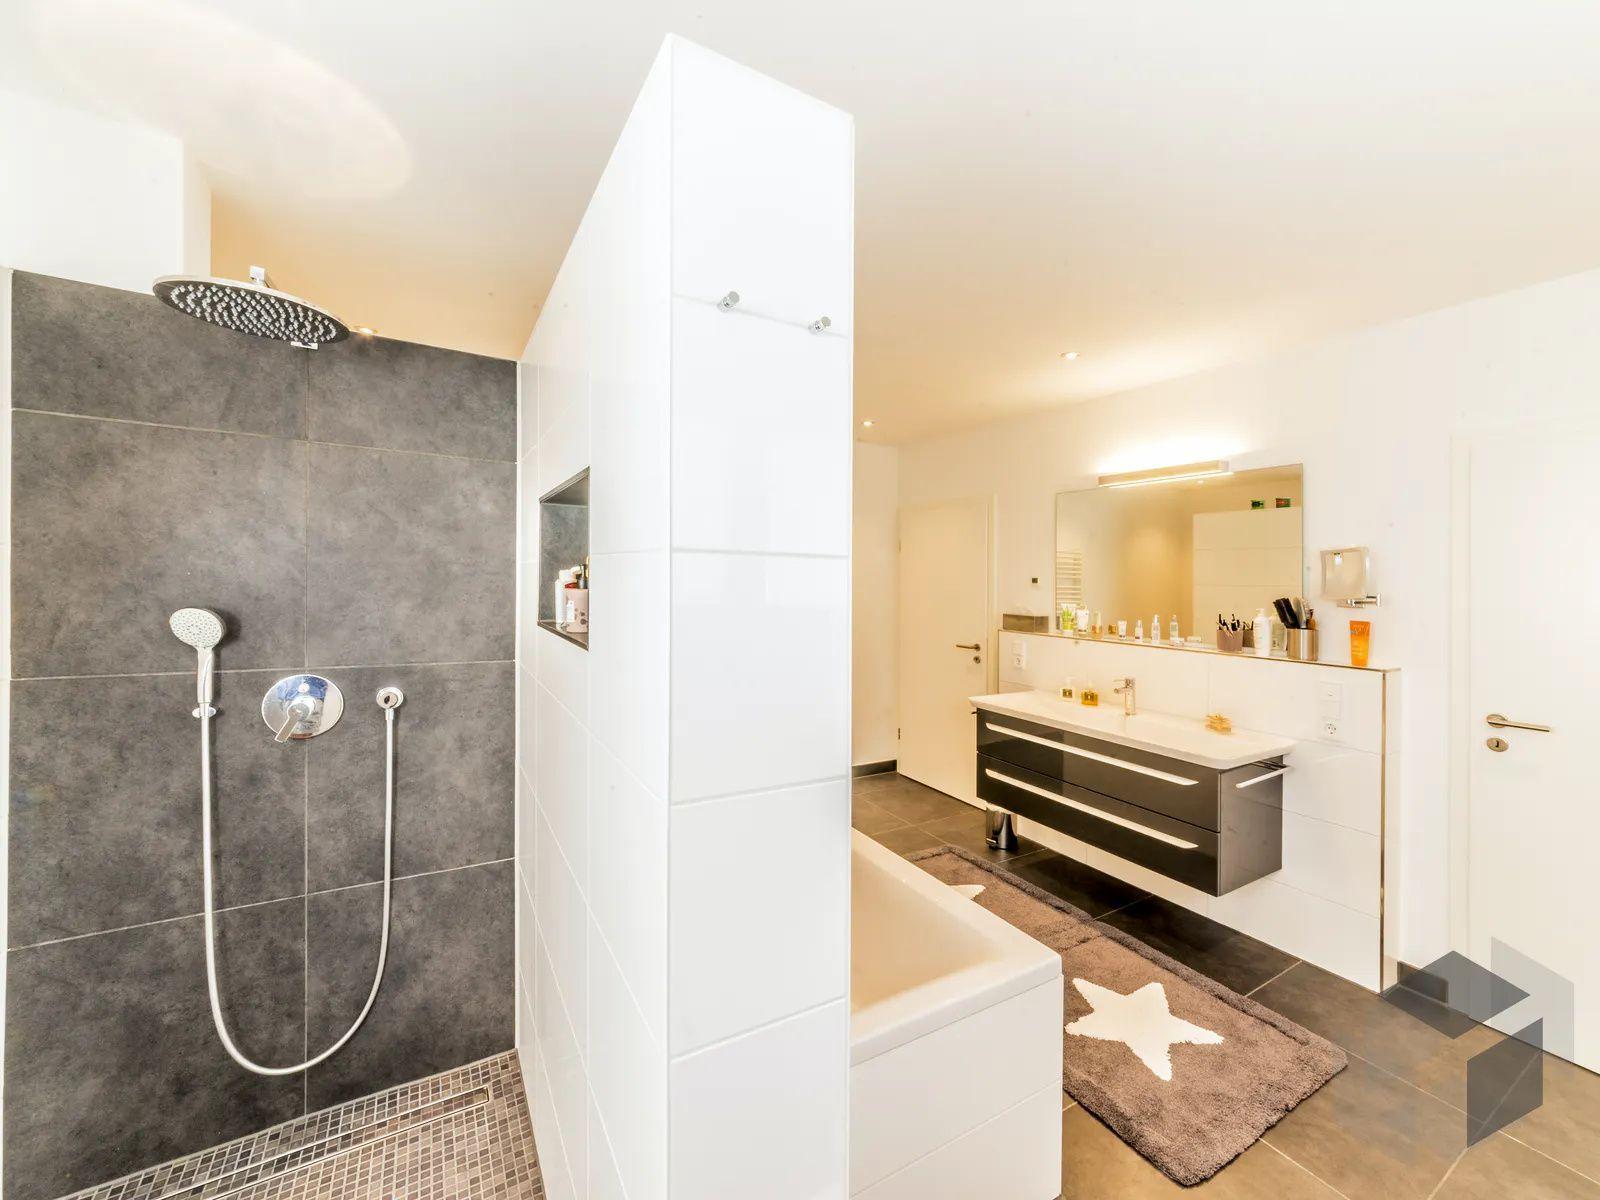 Modernes Badezimmer In 2020 Kubus Haus Badezimmer Innenausstattung Badezimmer